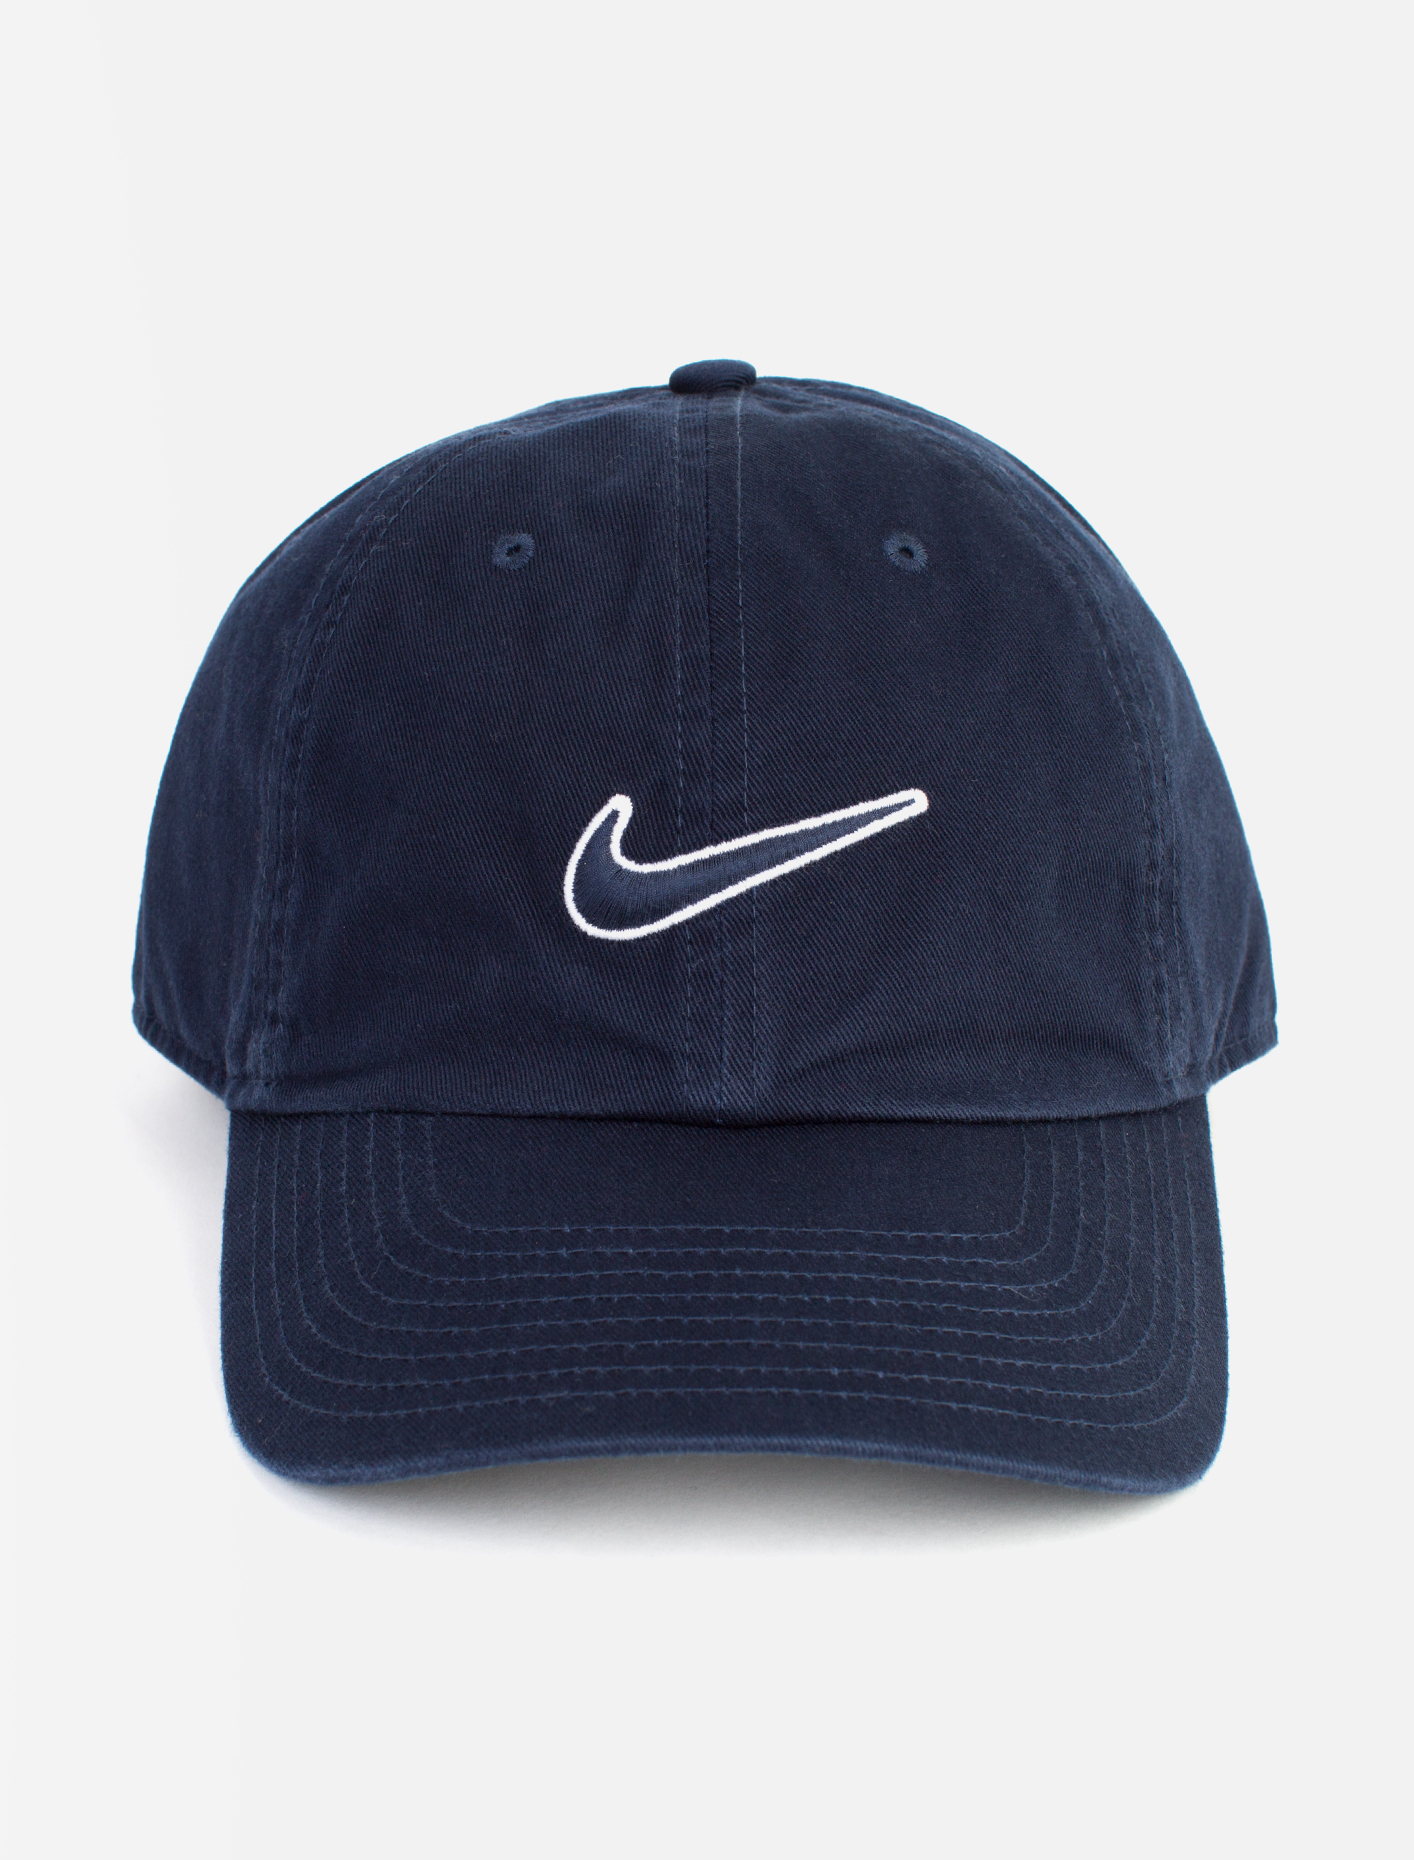 Preview  Nike Sportswear Heritage 86 Cap ... 4032627b4deb